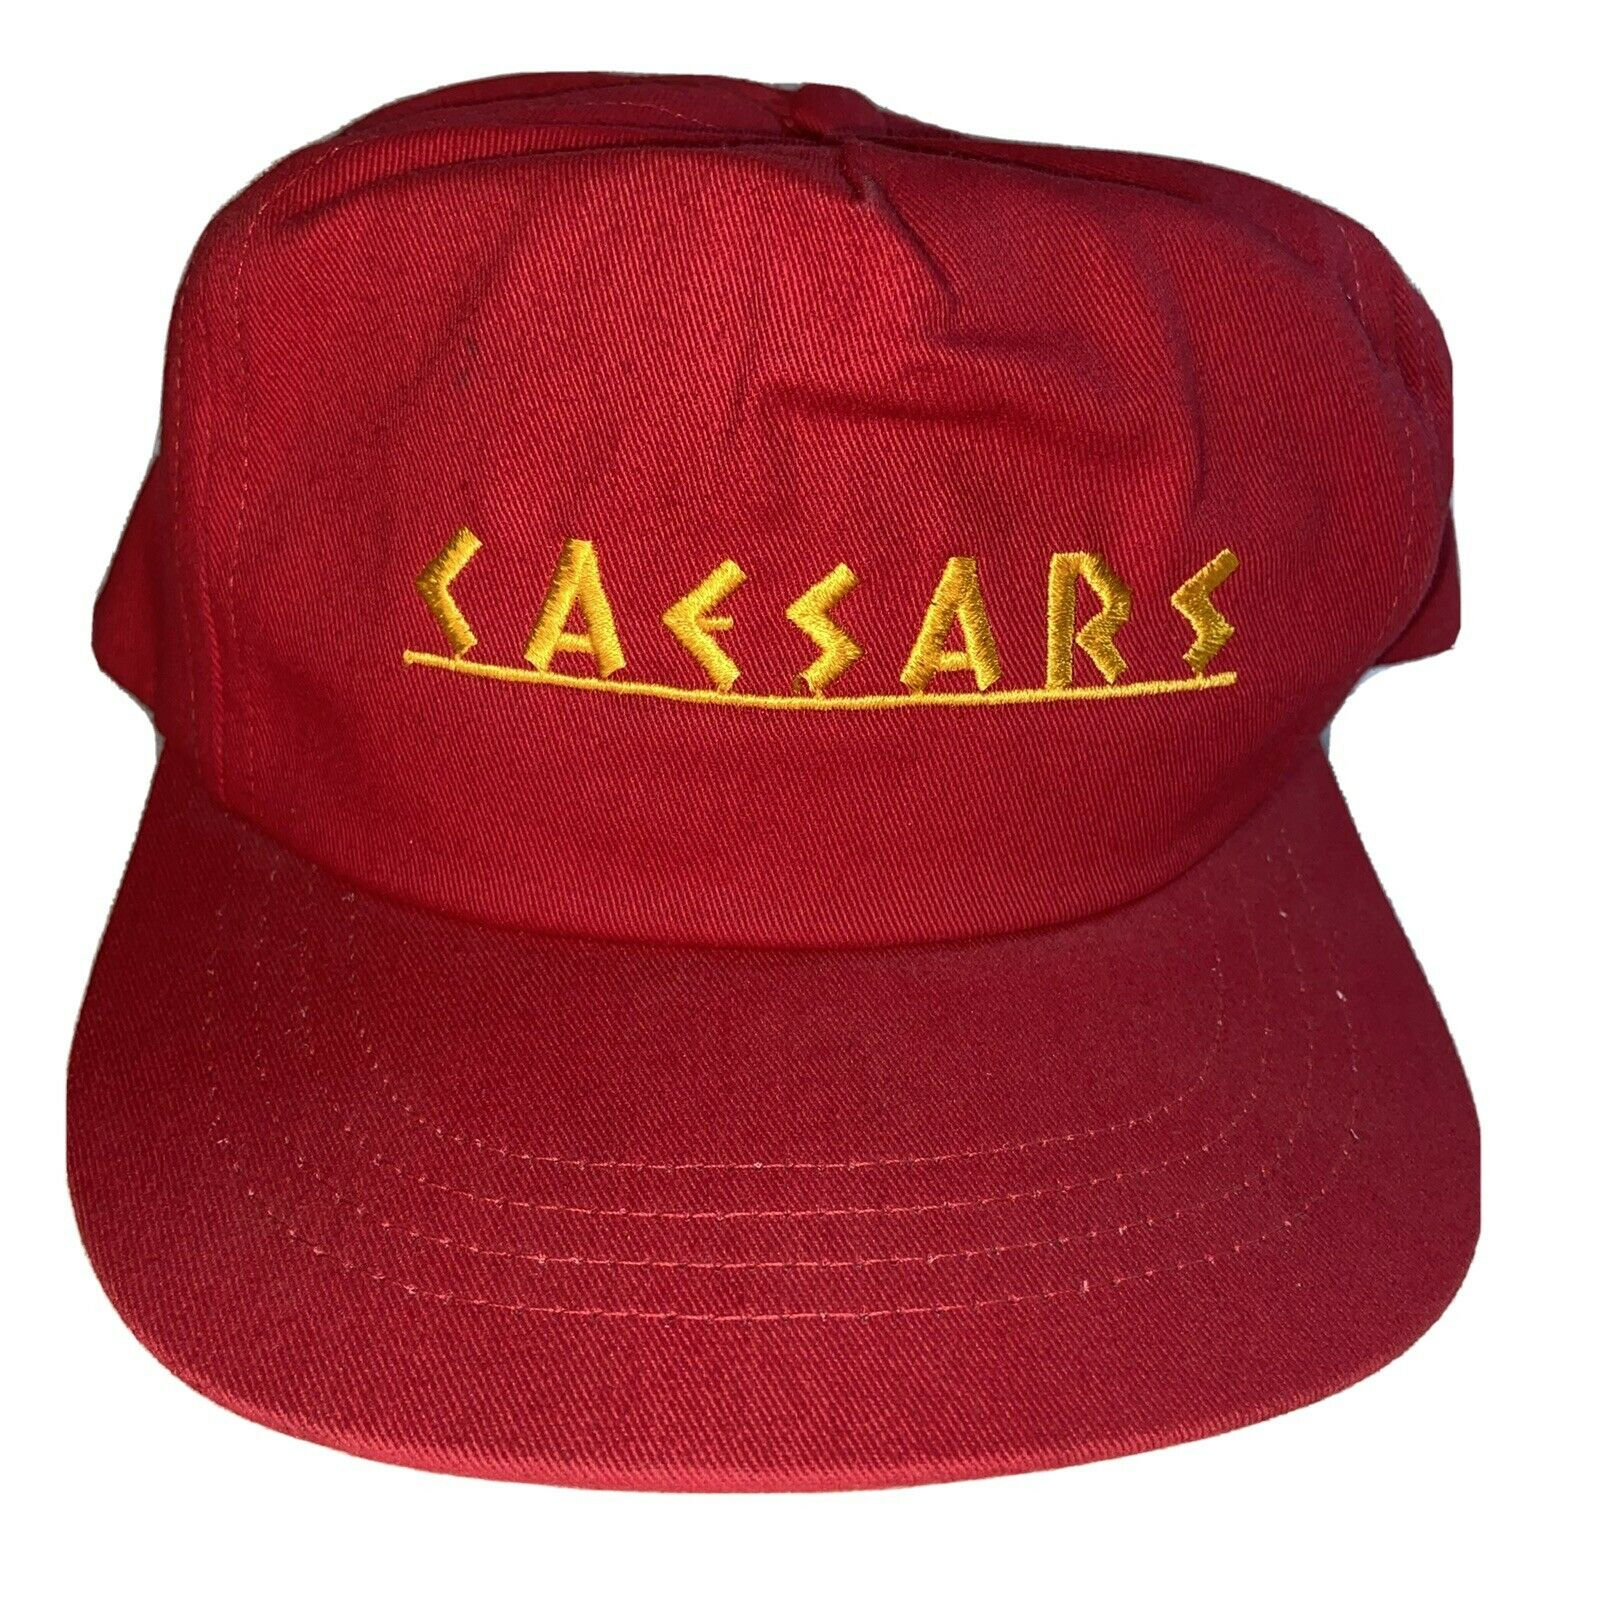 New EXCALIBUR Casino Las Vegas Poker Baseball Cap// Hat Black /& Gold 100/% Cotton